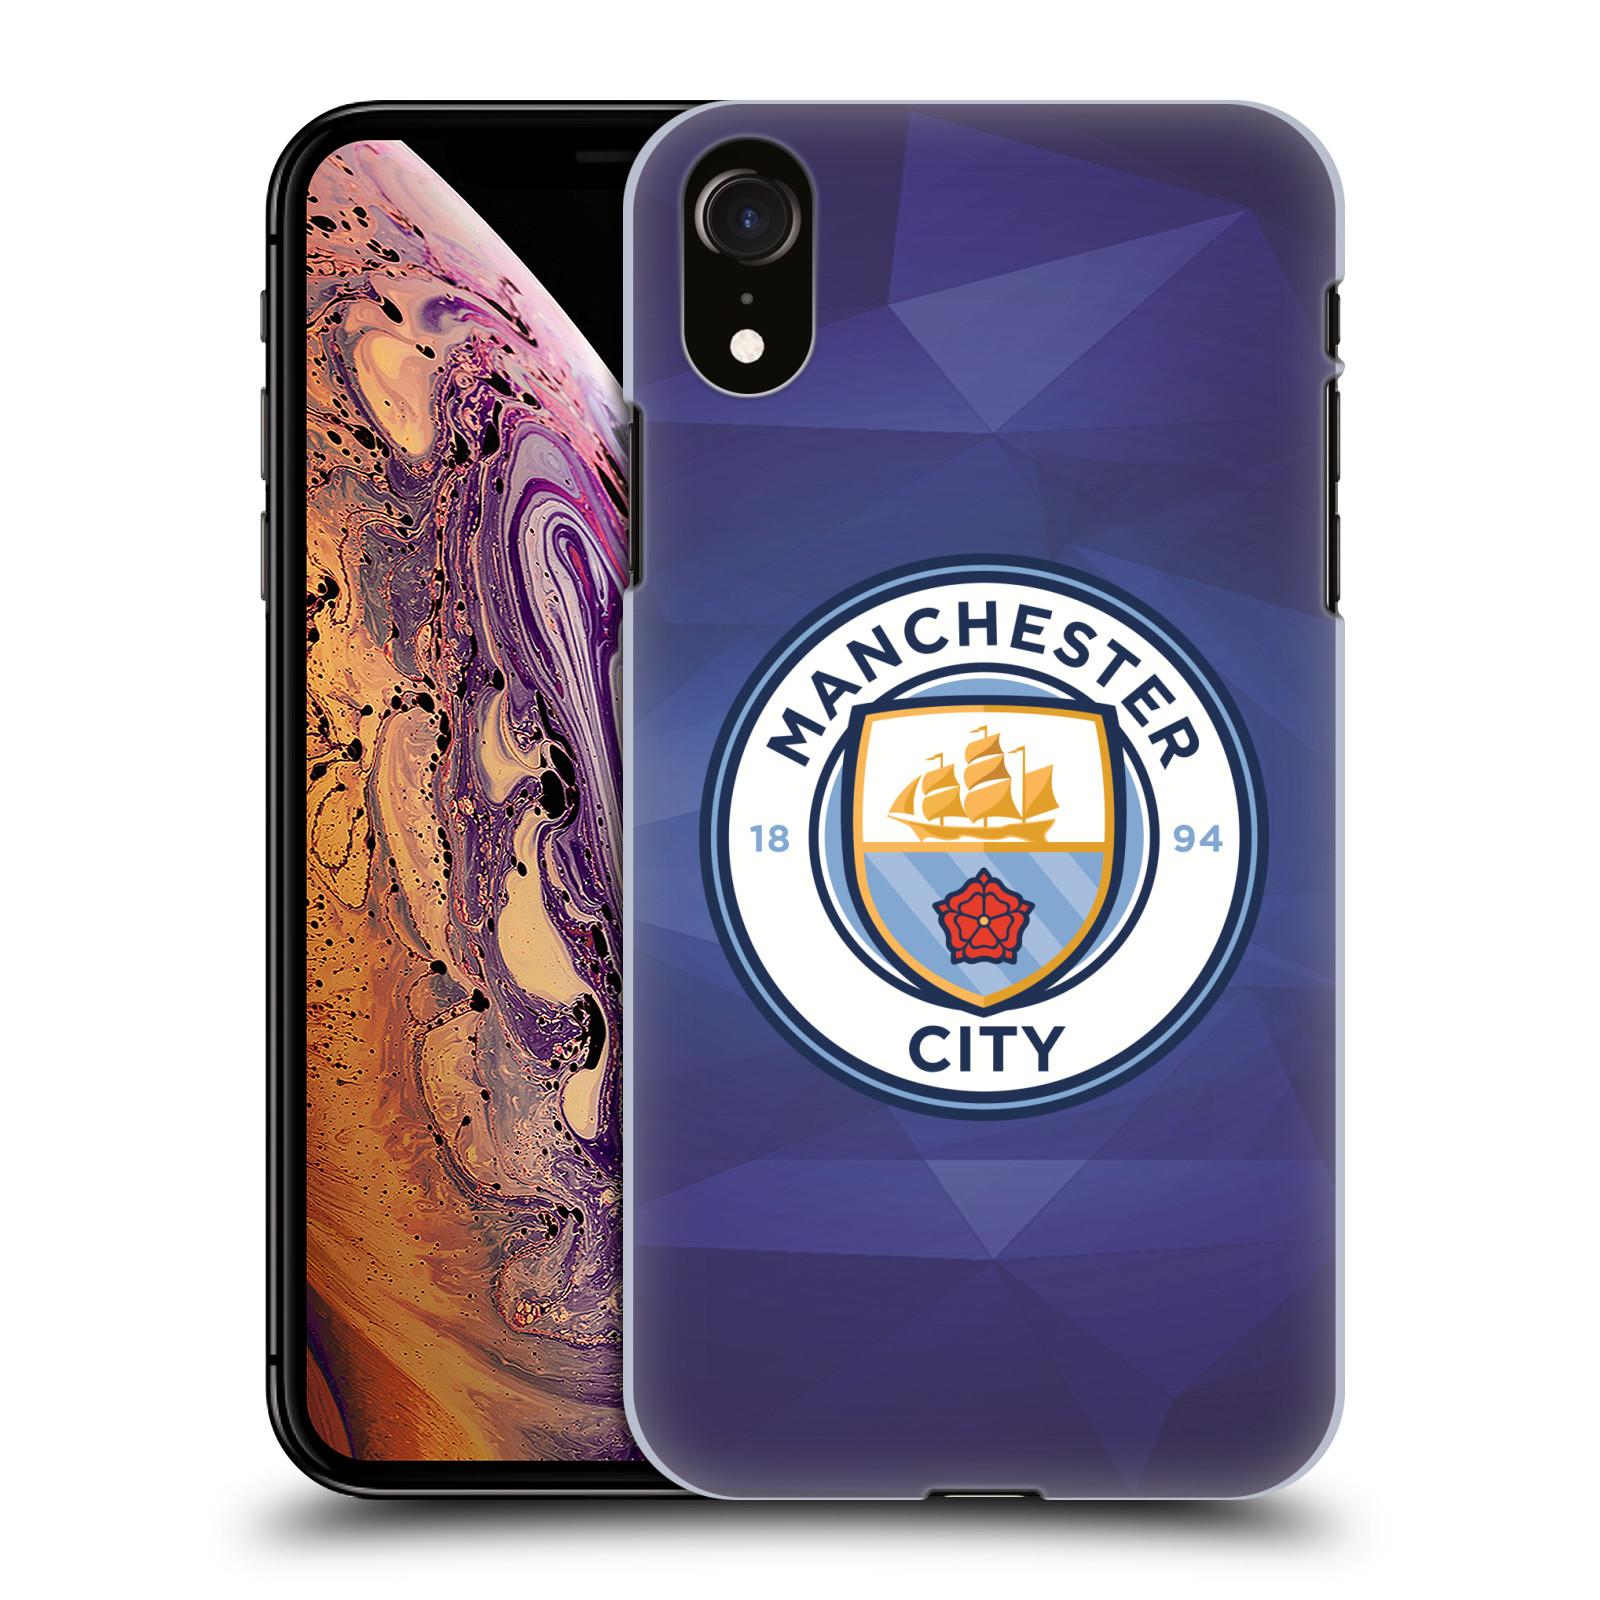 Plastové pouzdro na mobil Apple iPhone XR - Head Case - Manchester City FC - Modré nové logo